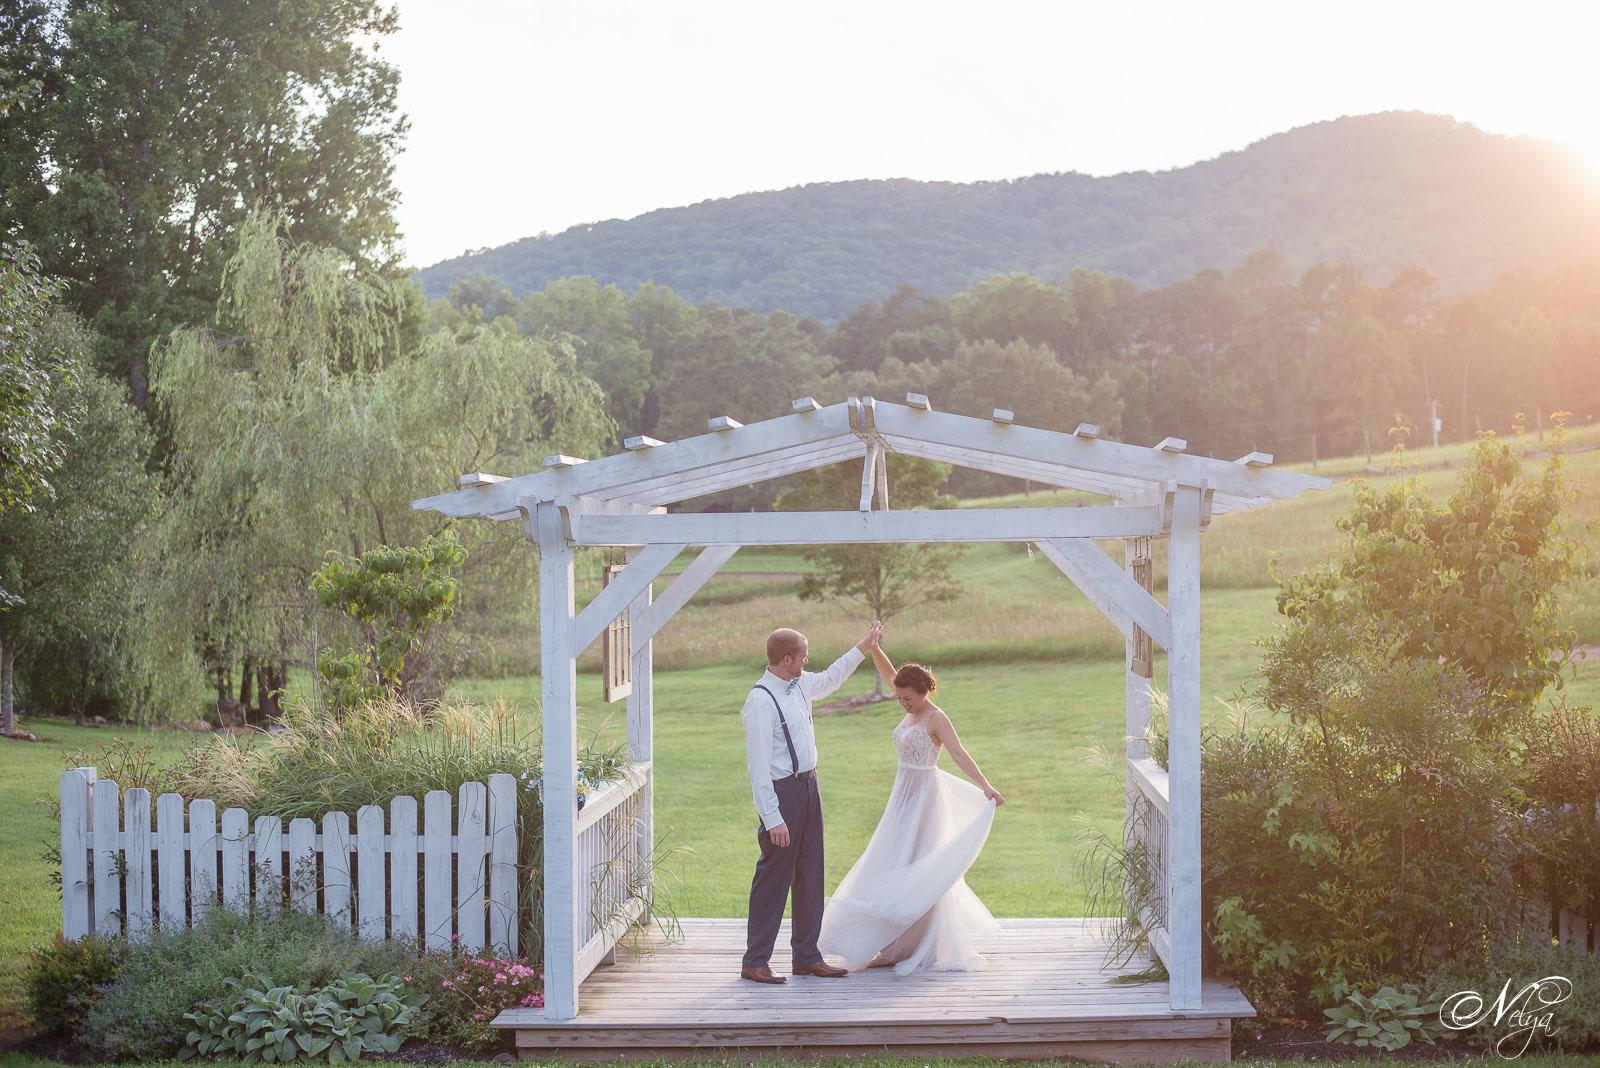 Sampson's Hollow Wallend TN wedding   Kristina +Justin